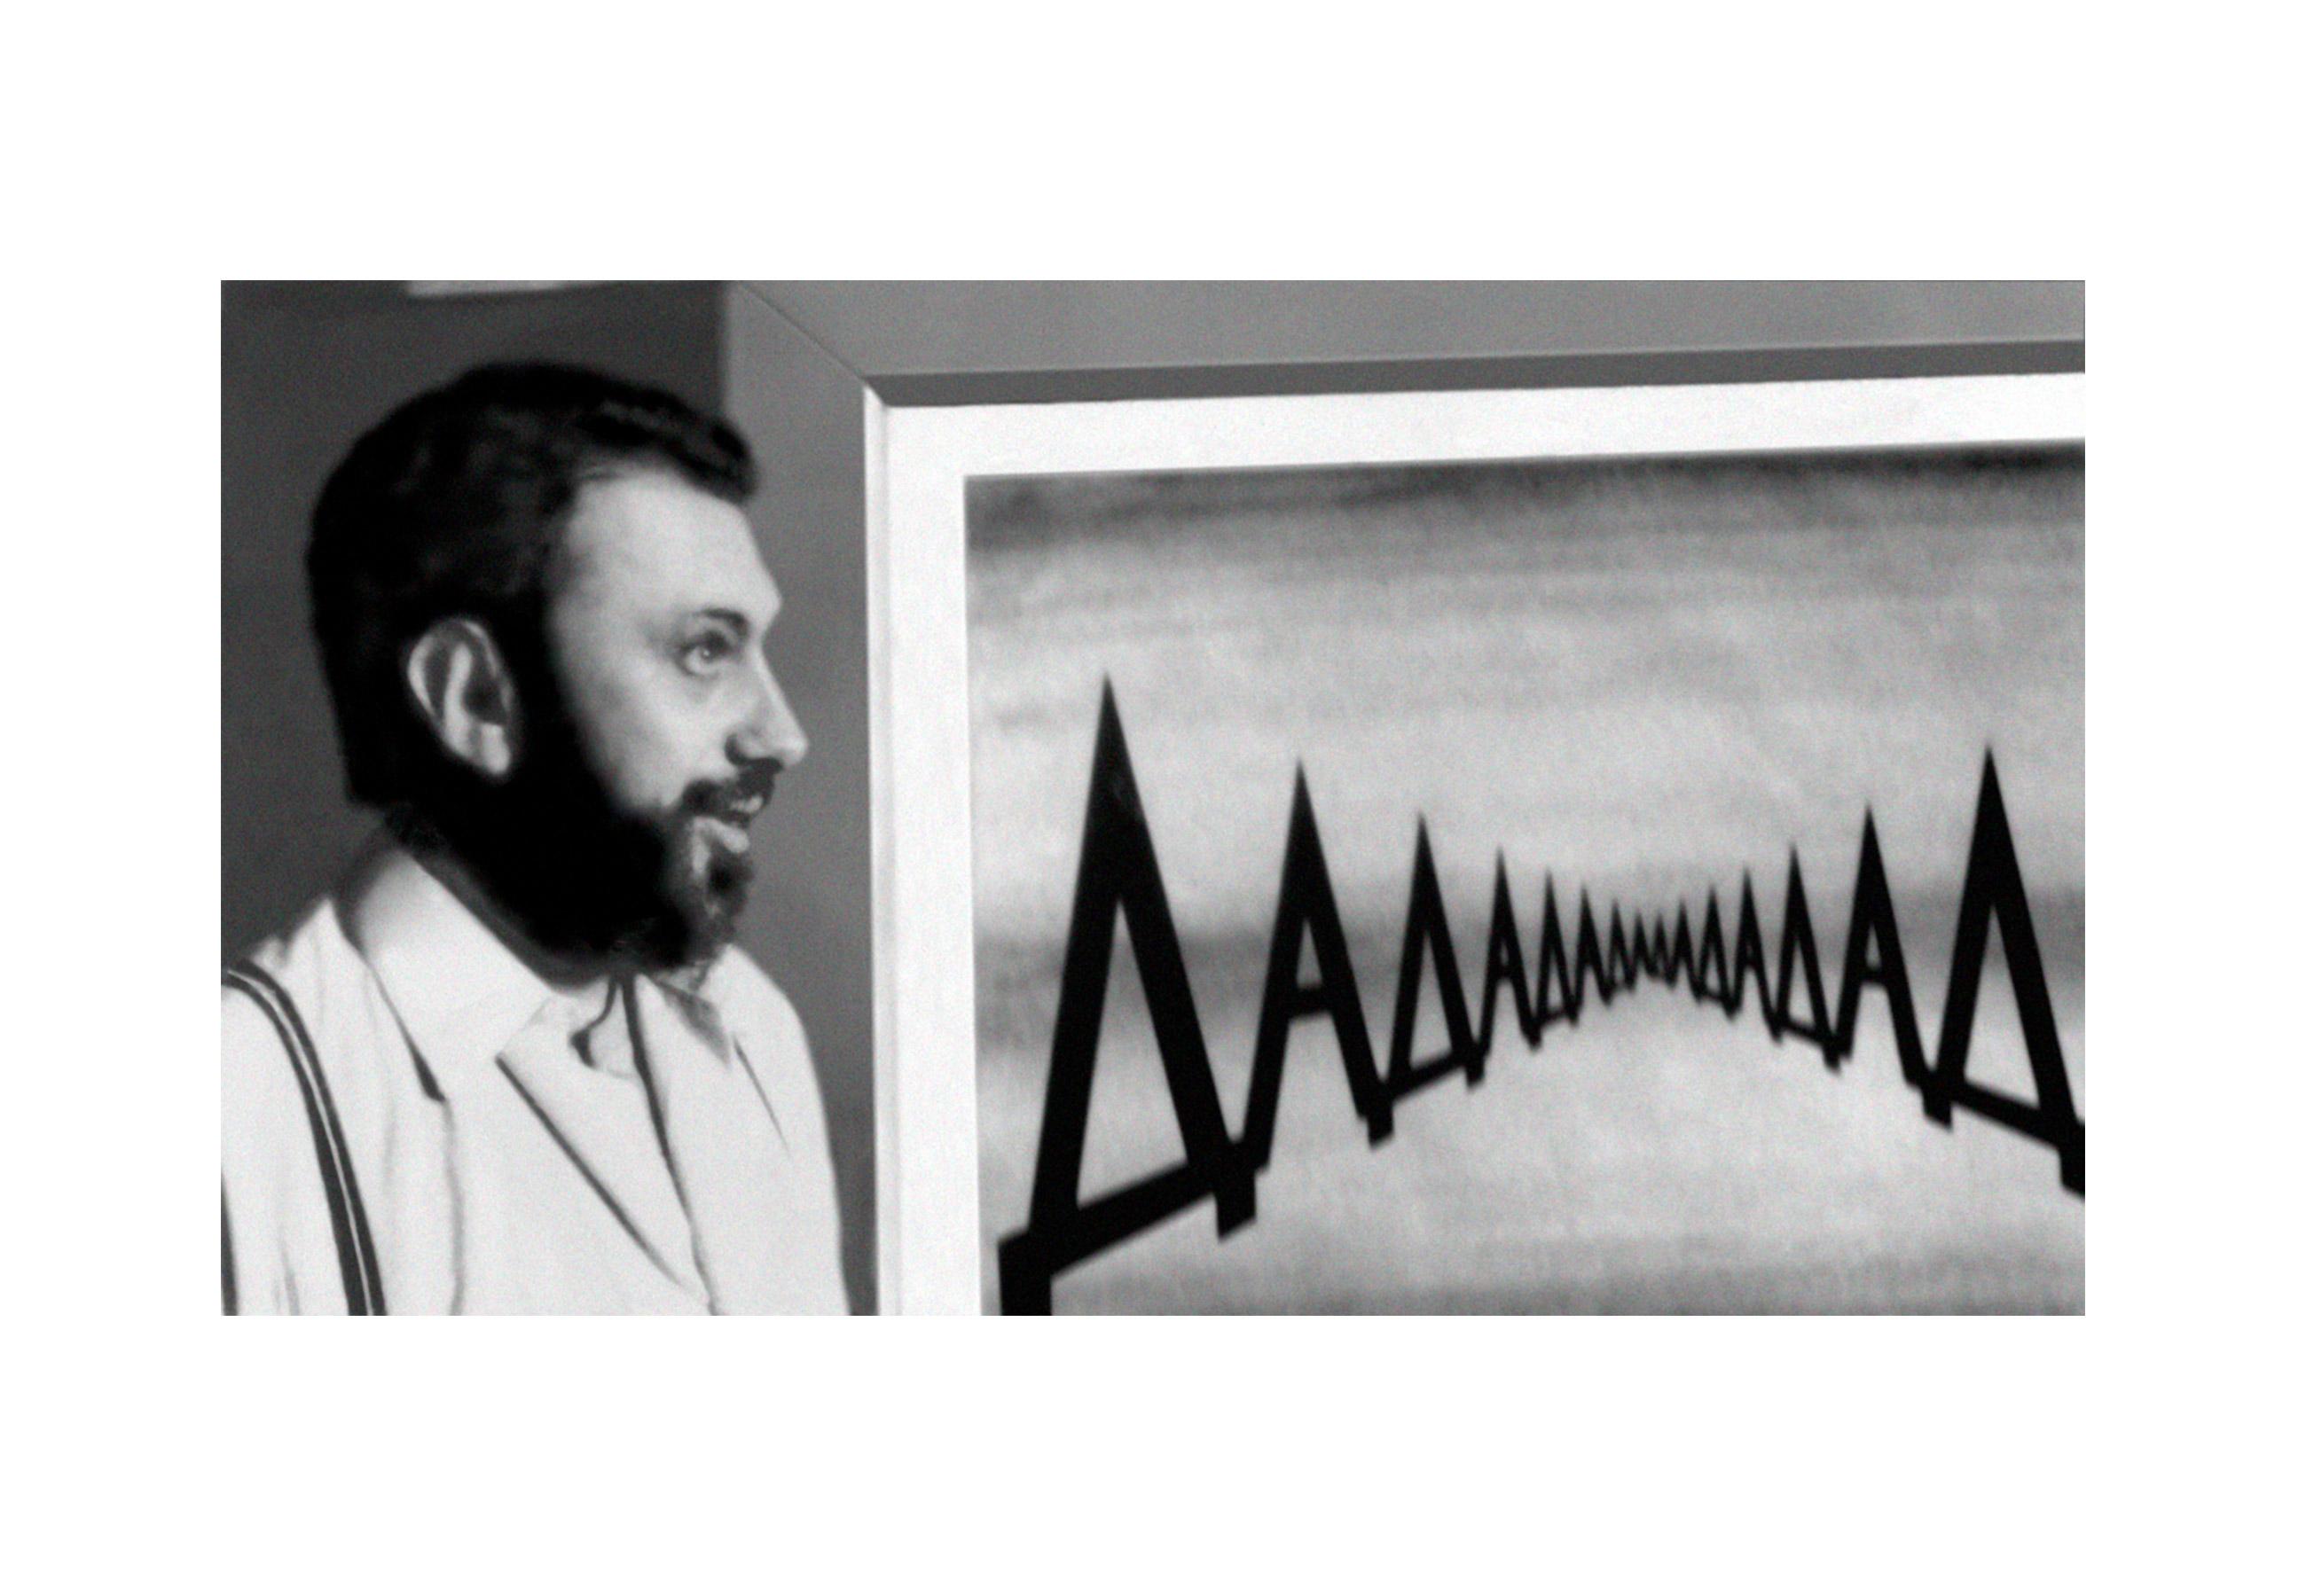 Lamm-Portfolio-1960-69-28-1.jpg